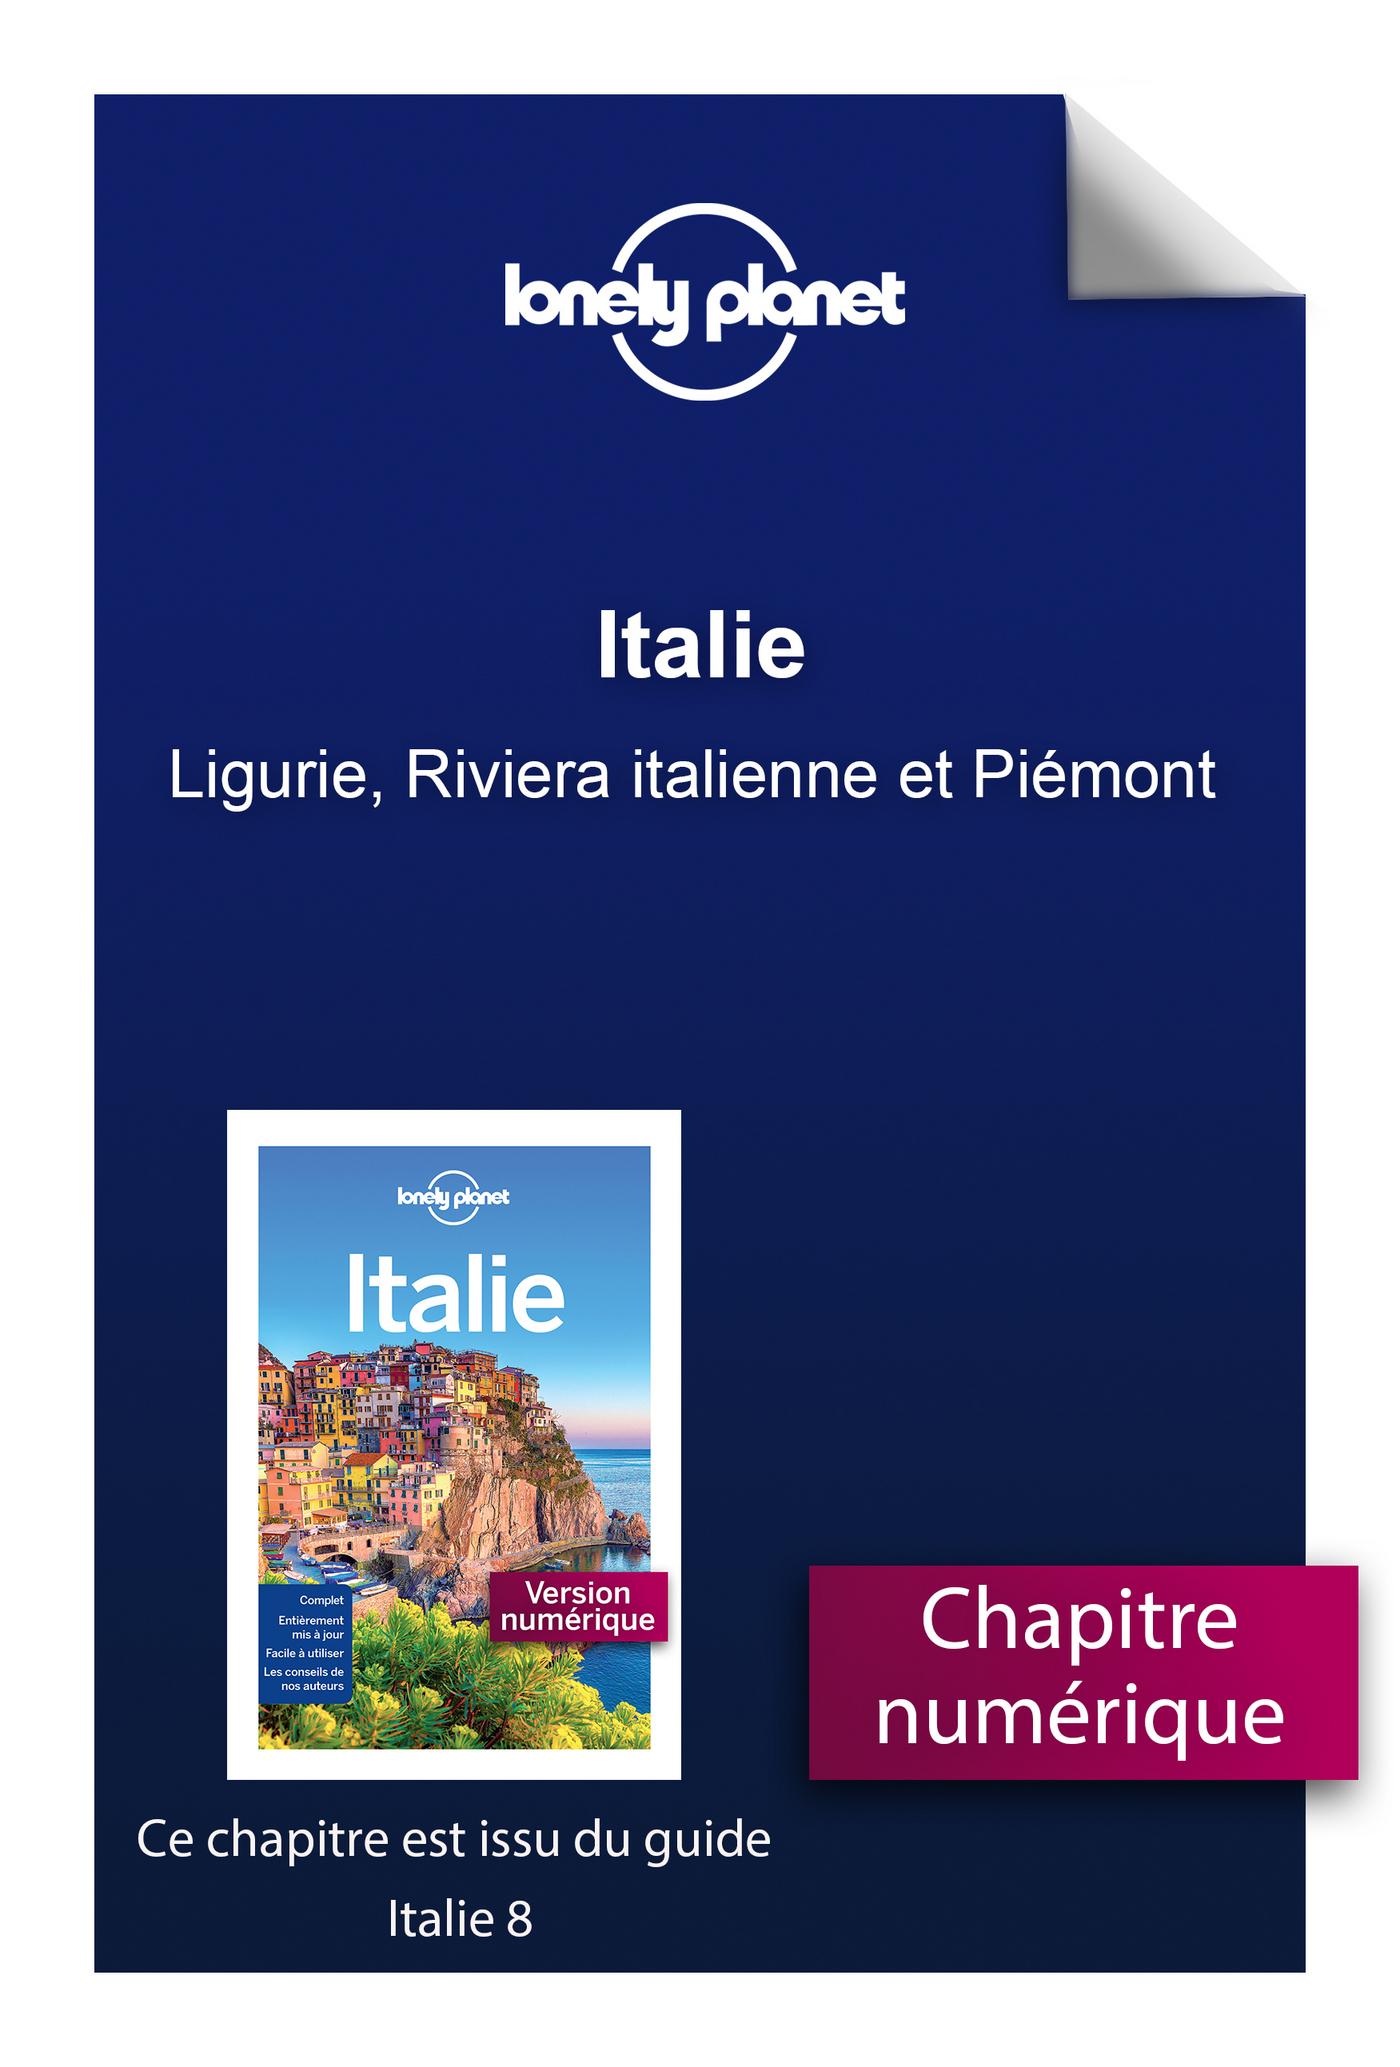 Italie - Ligurie, Riviera italienne et Piémont